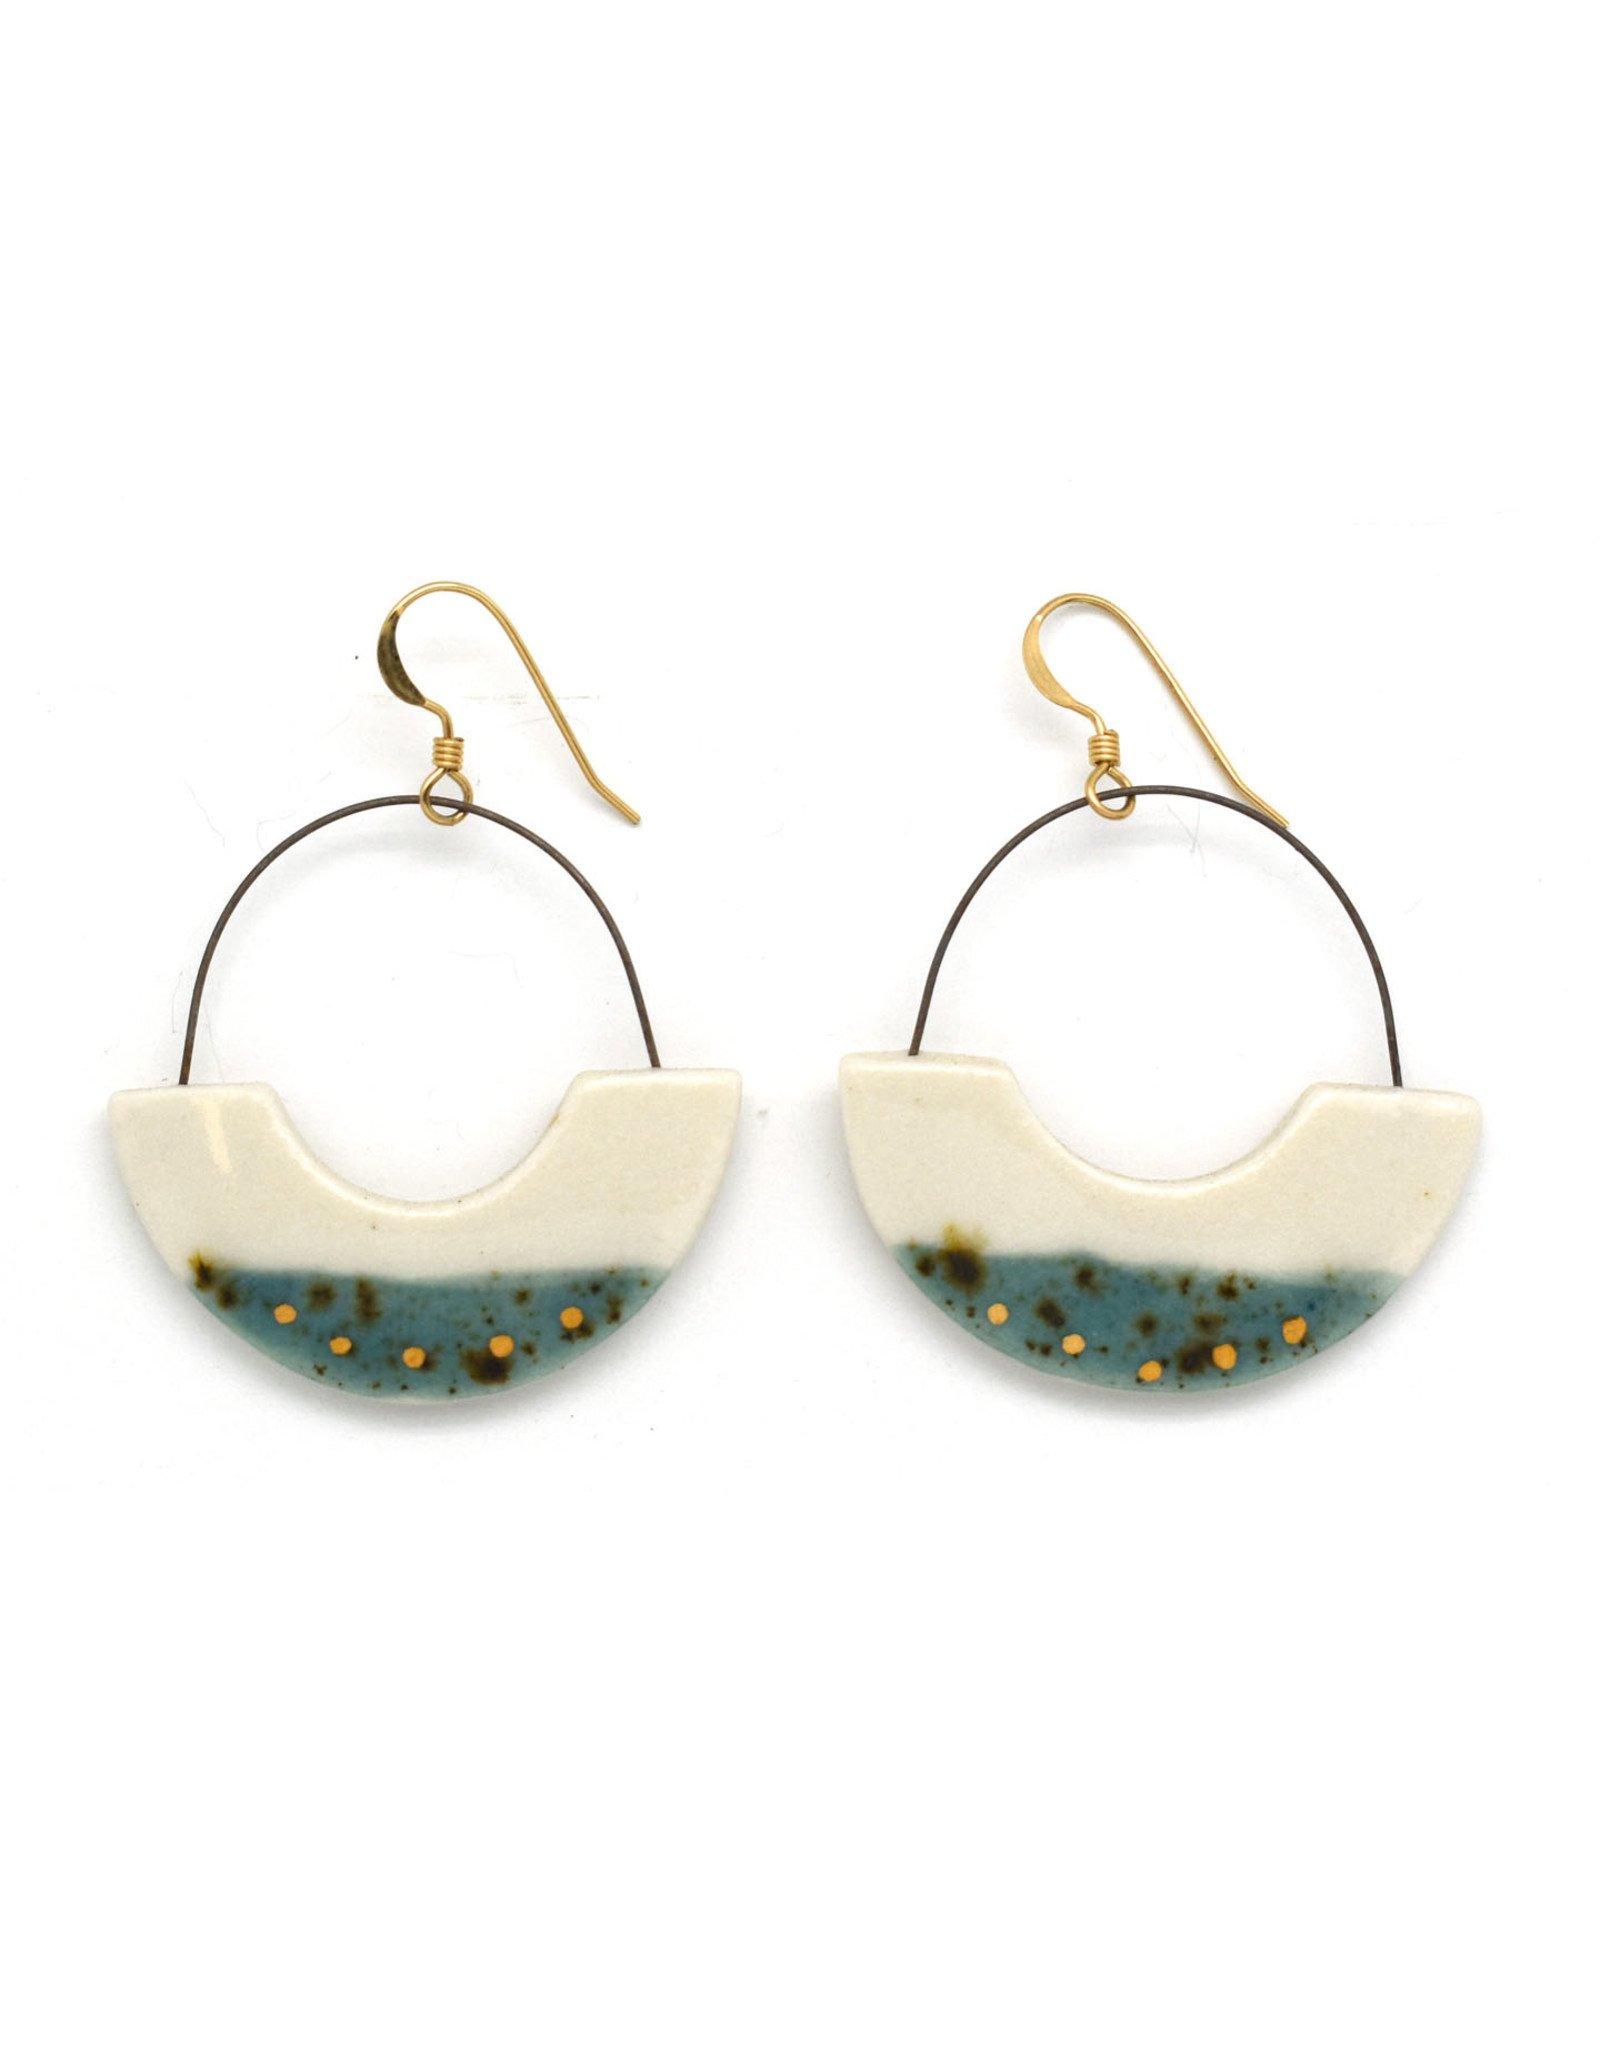 Half Circle Hoop Earrings -  Gold/Shipwreck